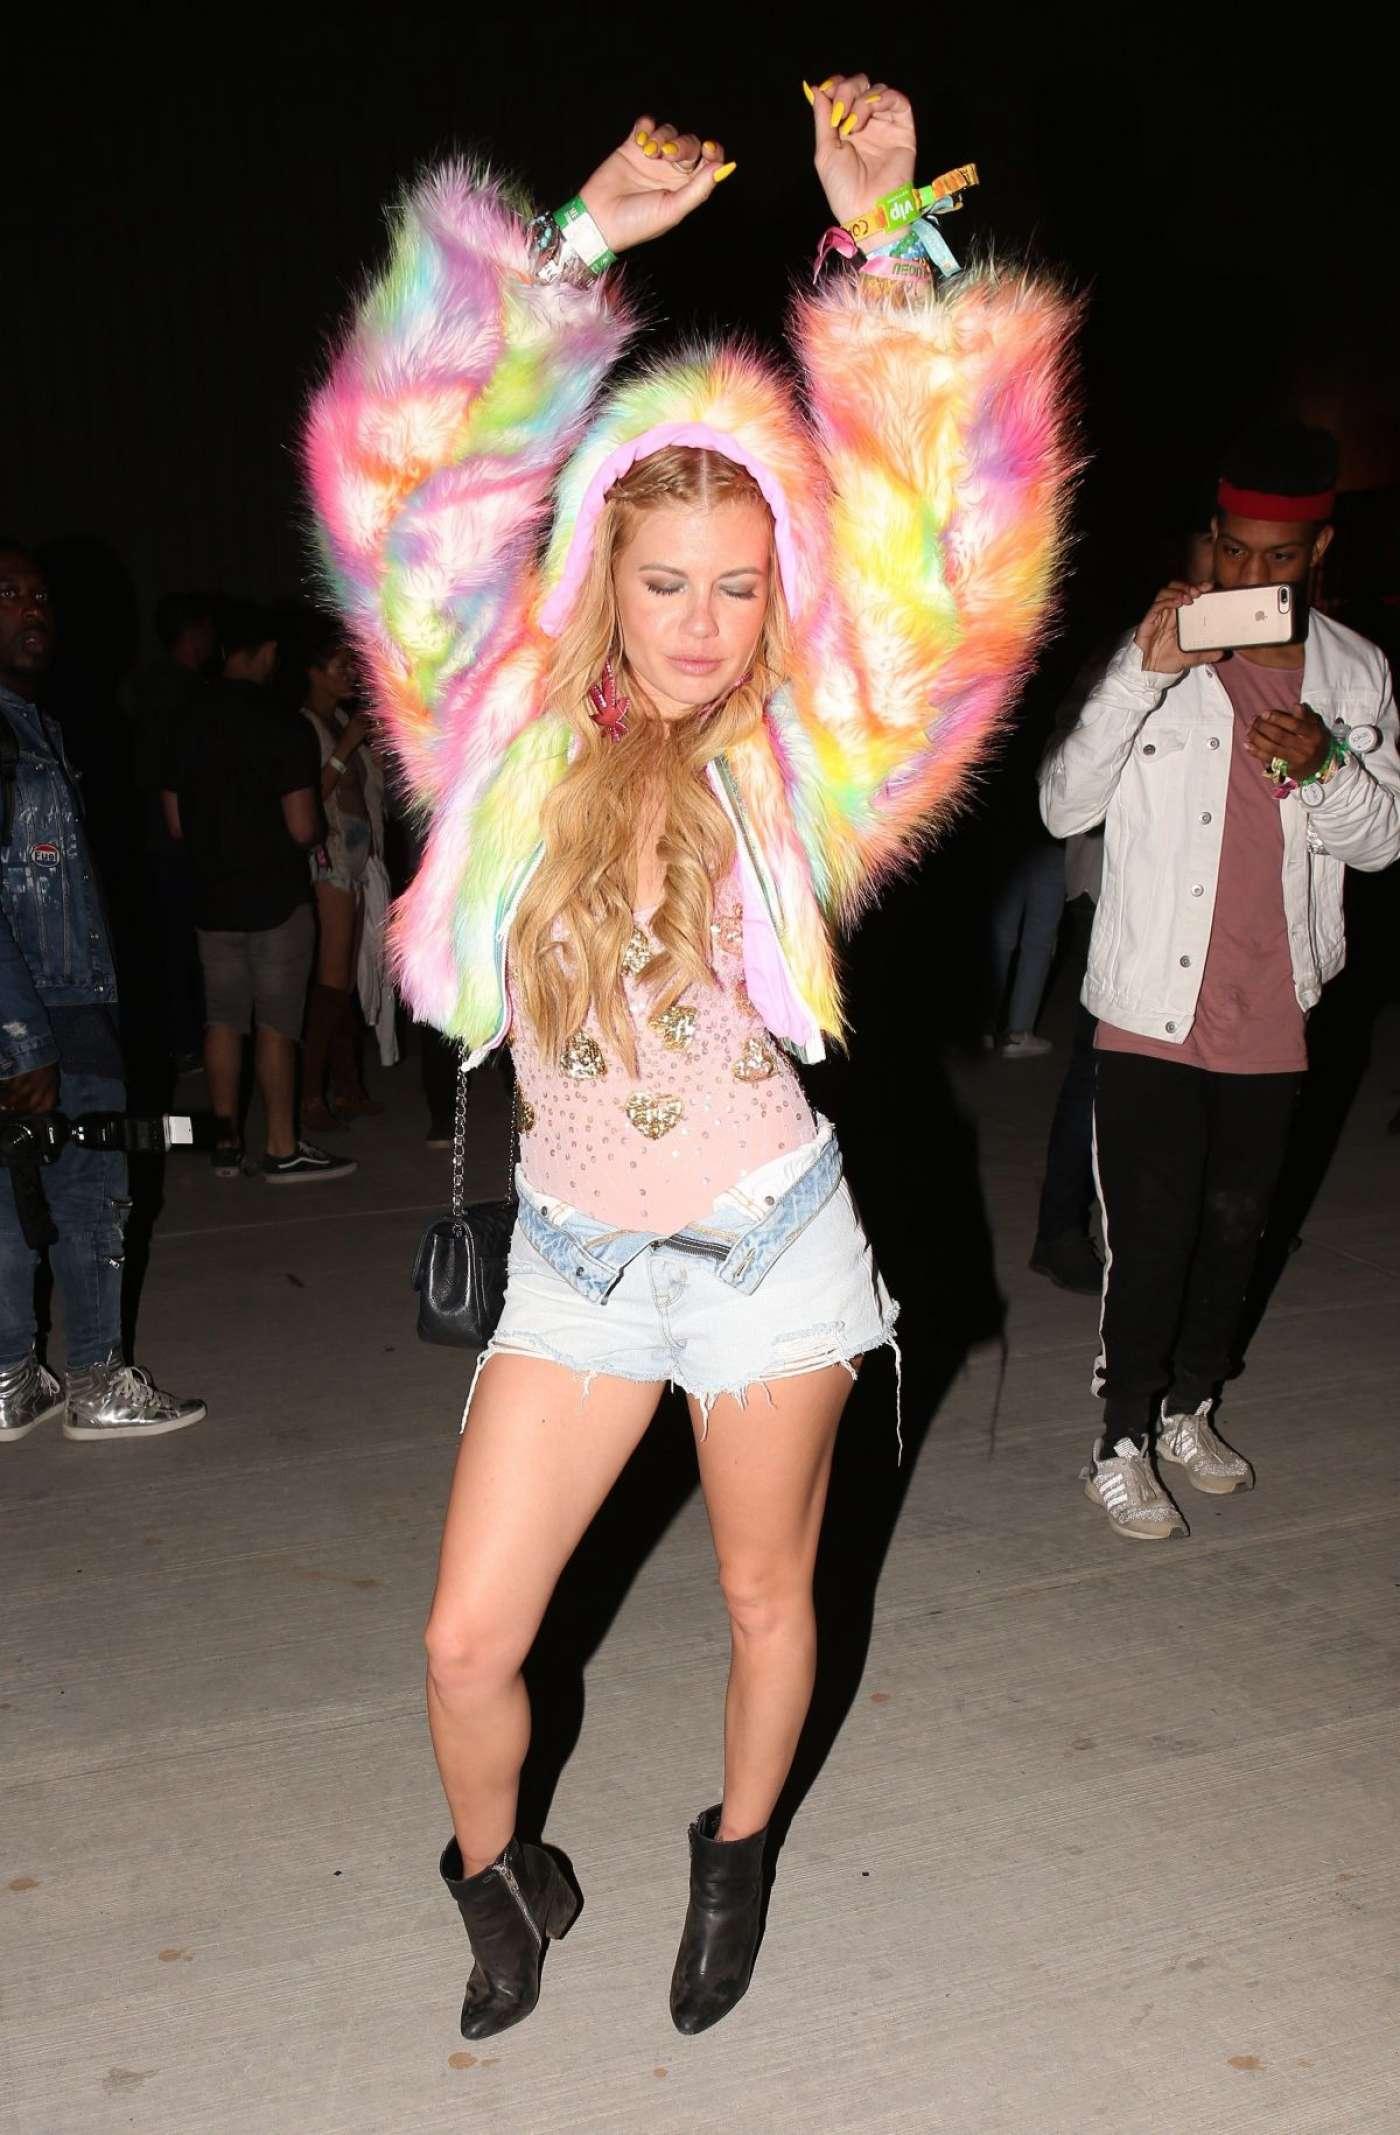 Chanel West Coast Neon Carnival Held At 2017 Coachella